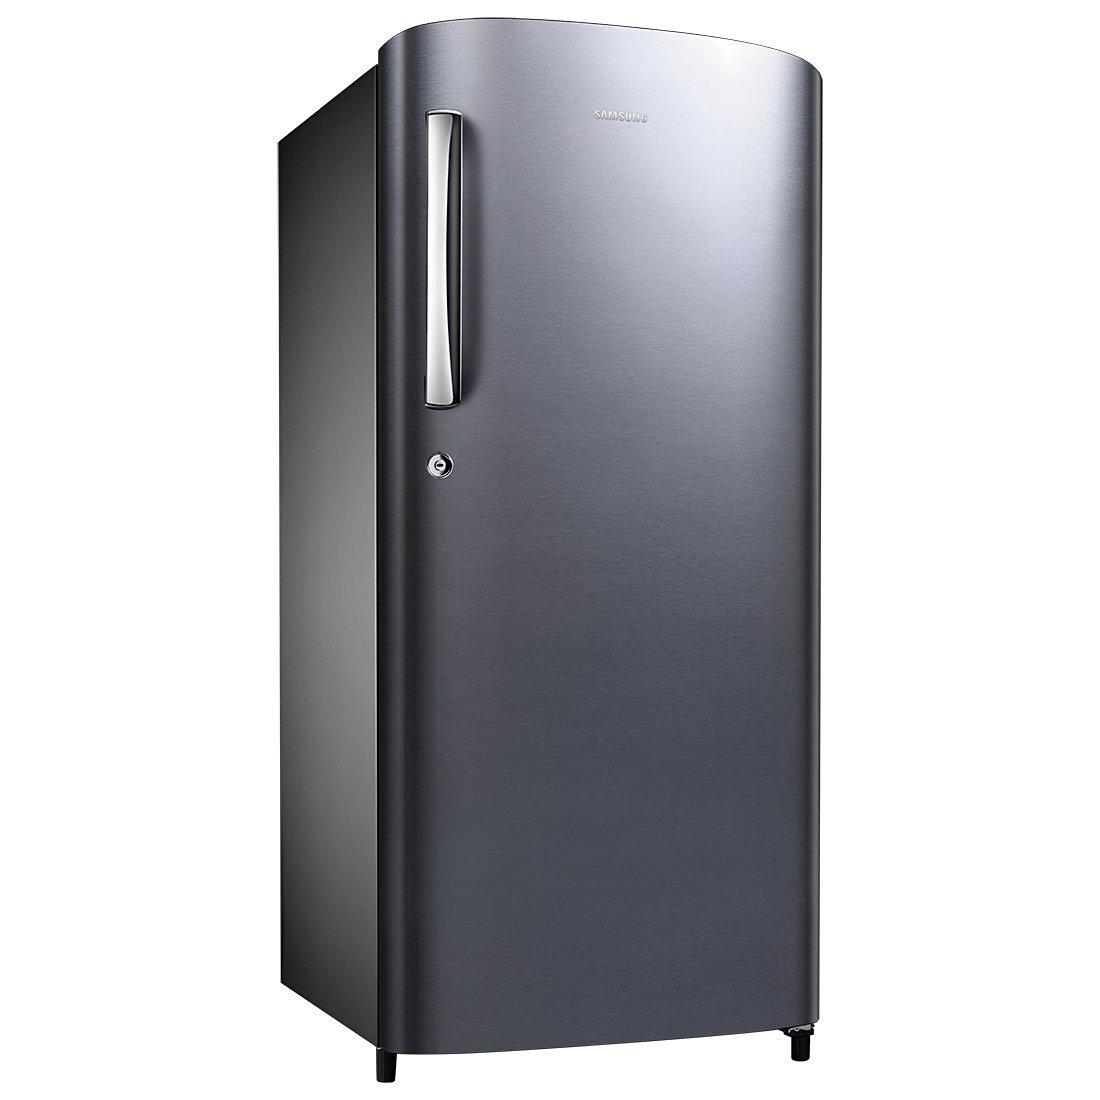 Samsung 192 L Direct Cool Single Door Refrigerator (RR19J21C3VJ) Image